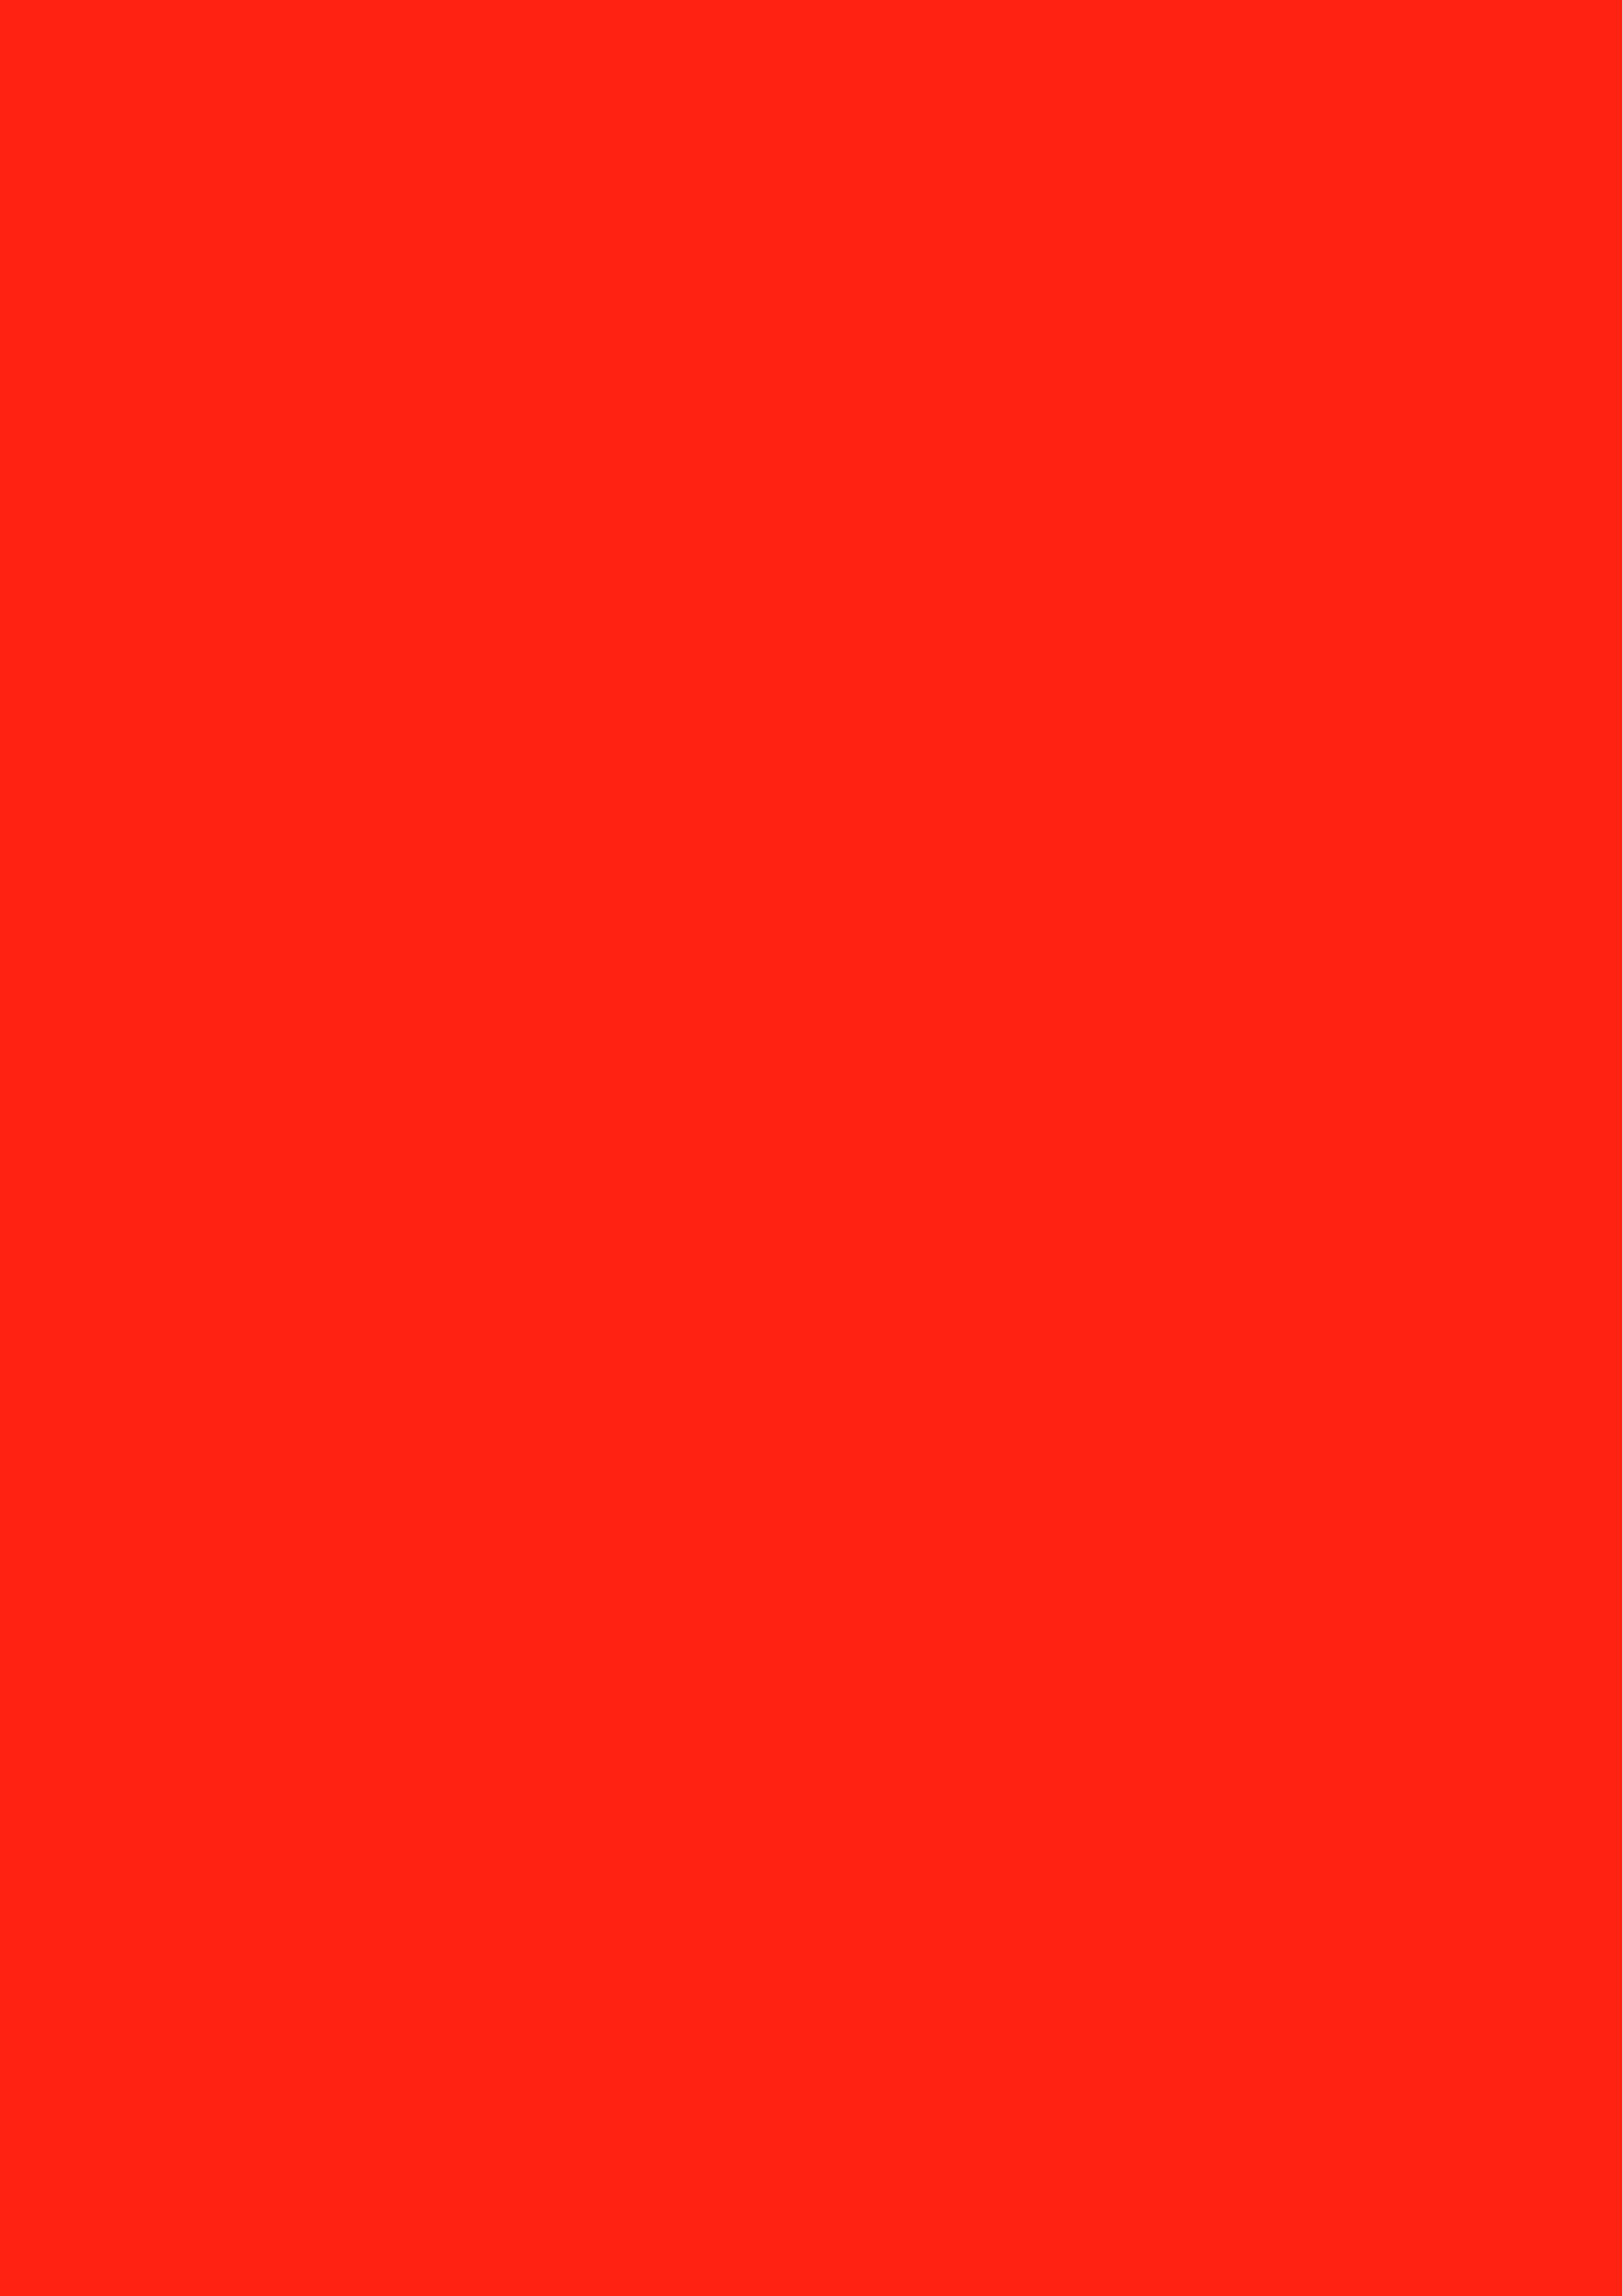 achtergrond poster rood - oranje